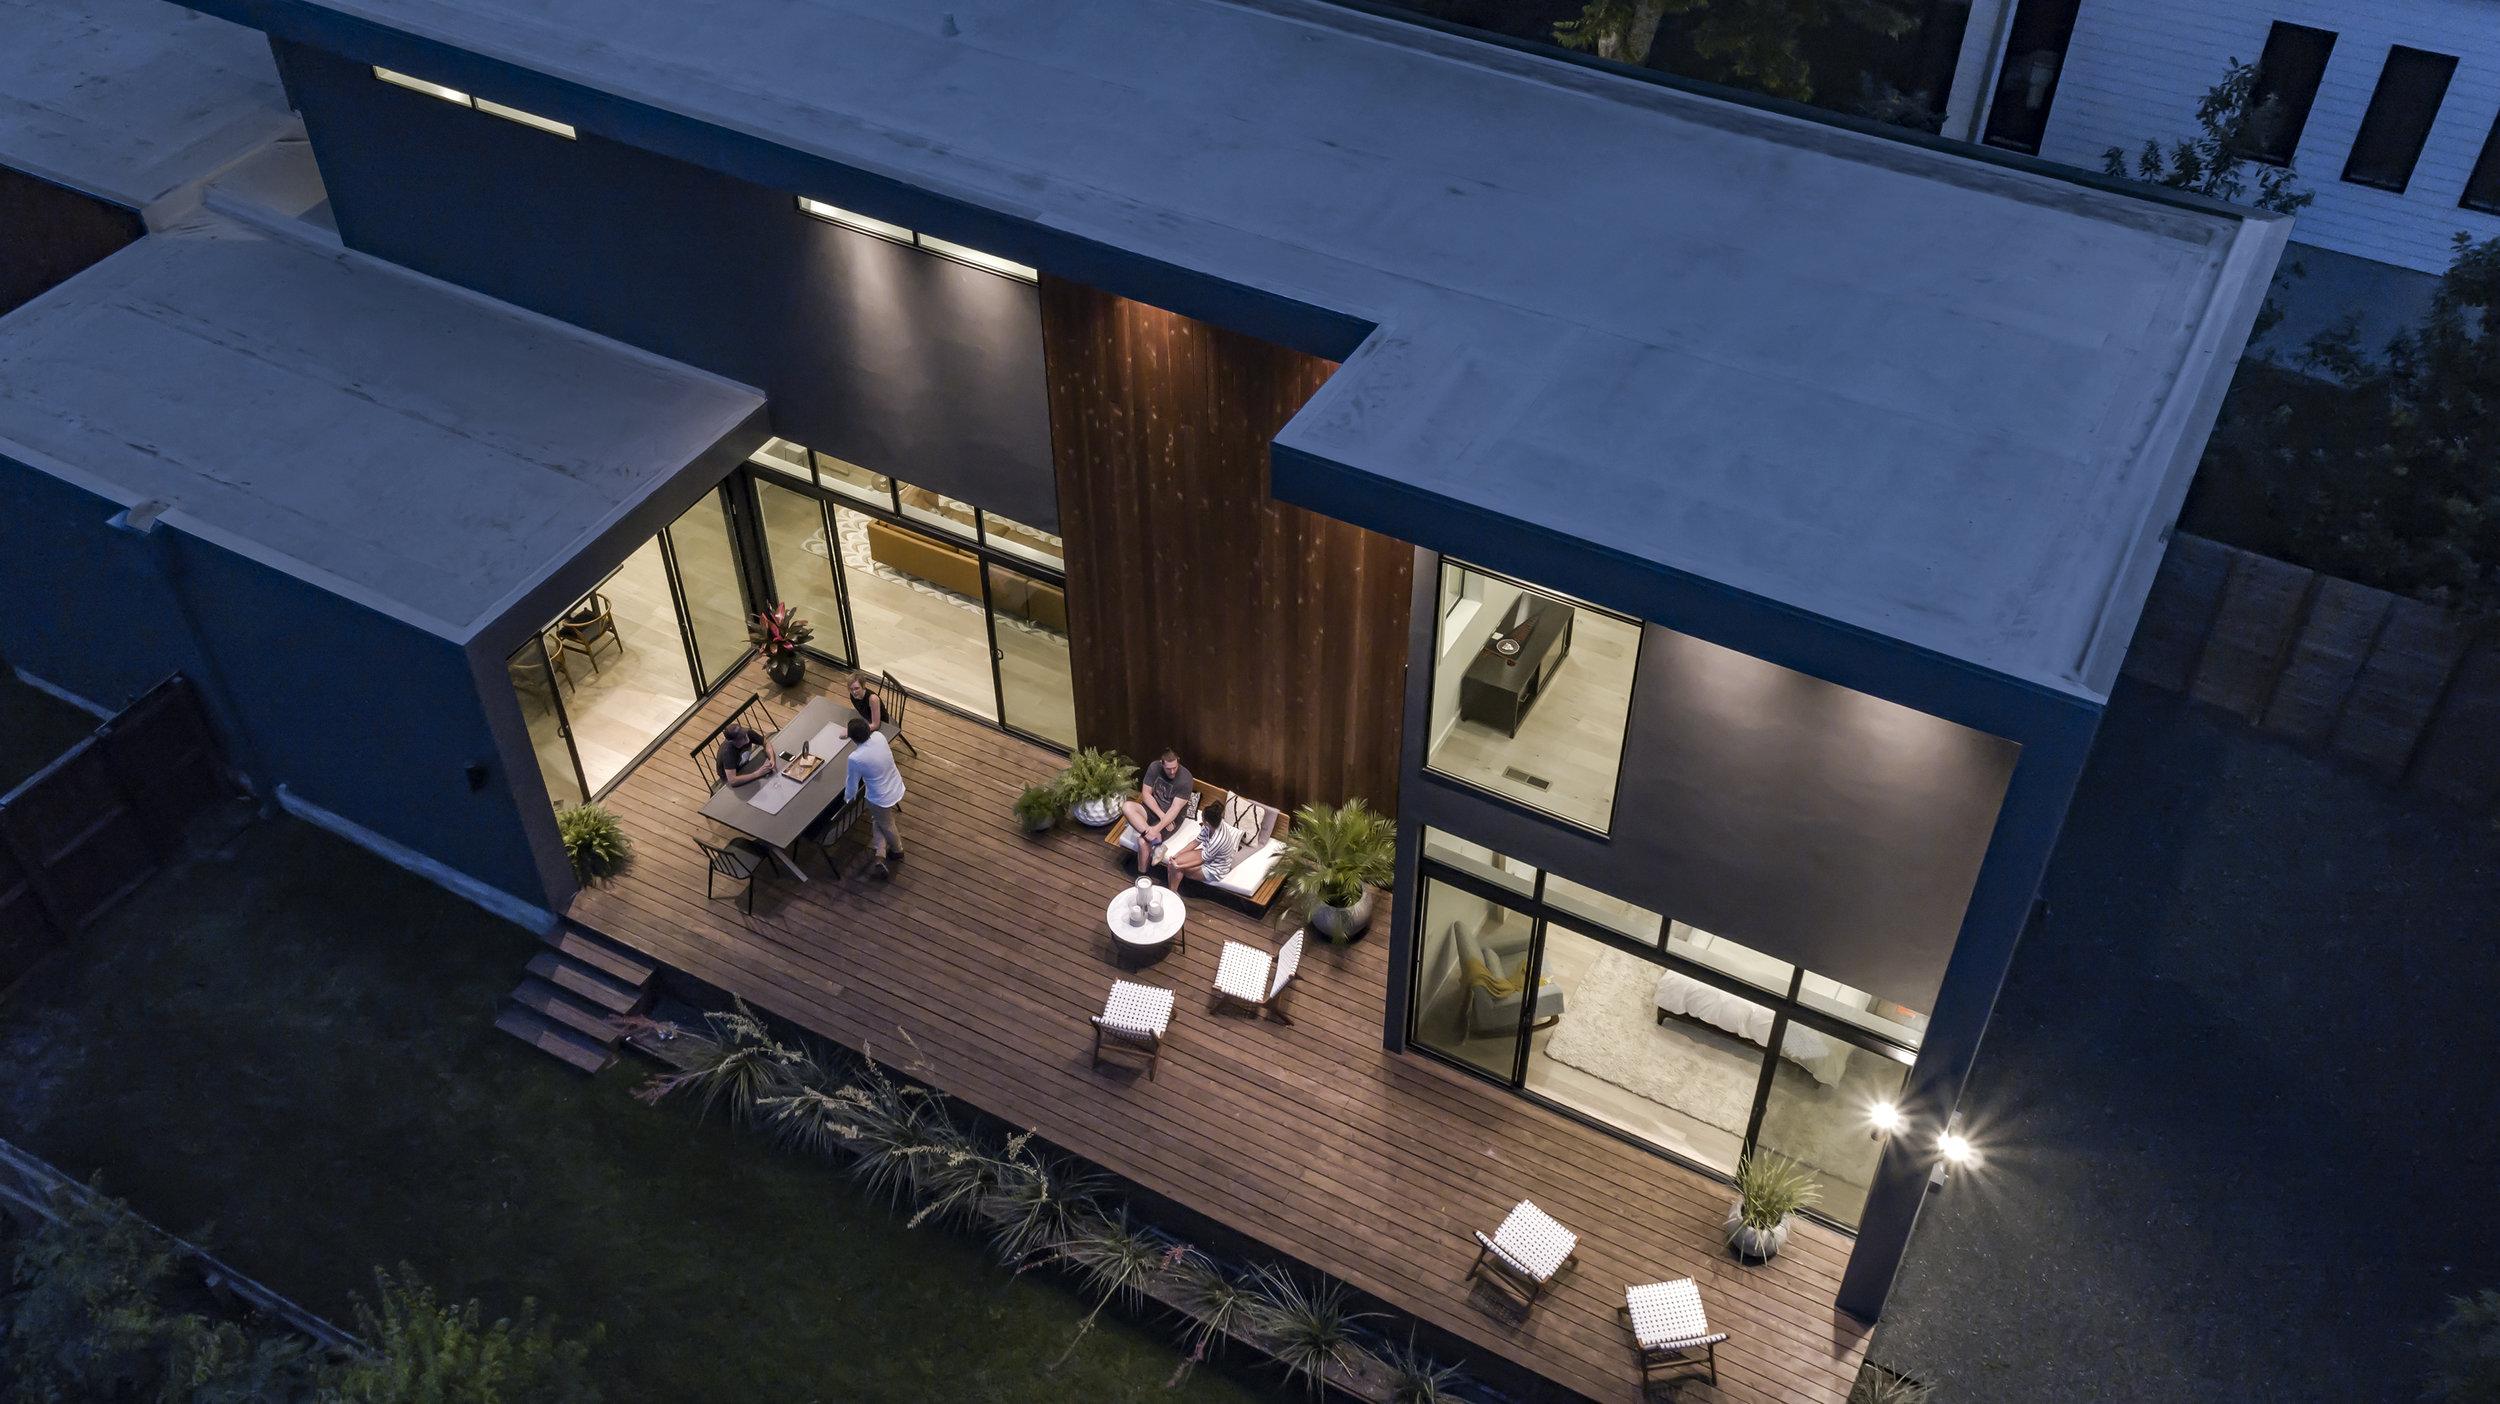 Matt Fajkus MF Architecture Add Subtract House_Photo 15 by Charles Davis Smith.jpg